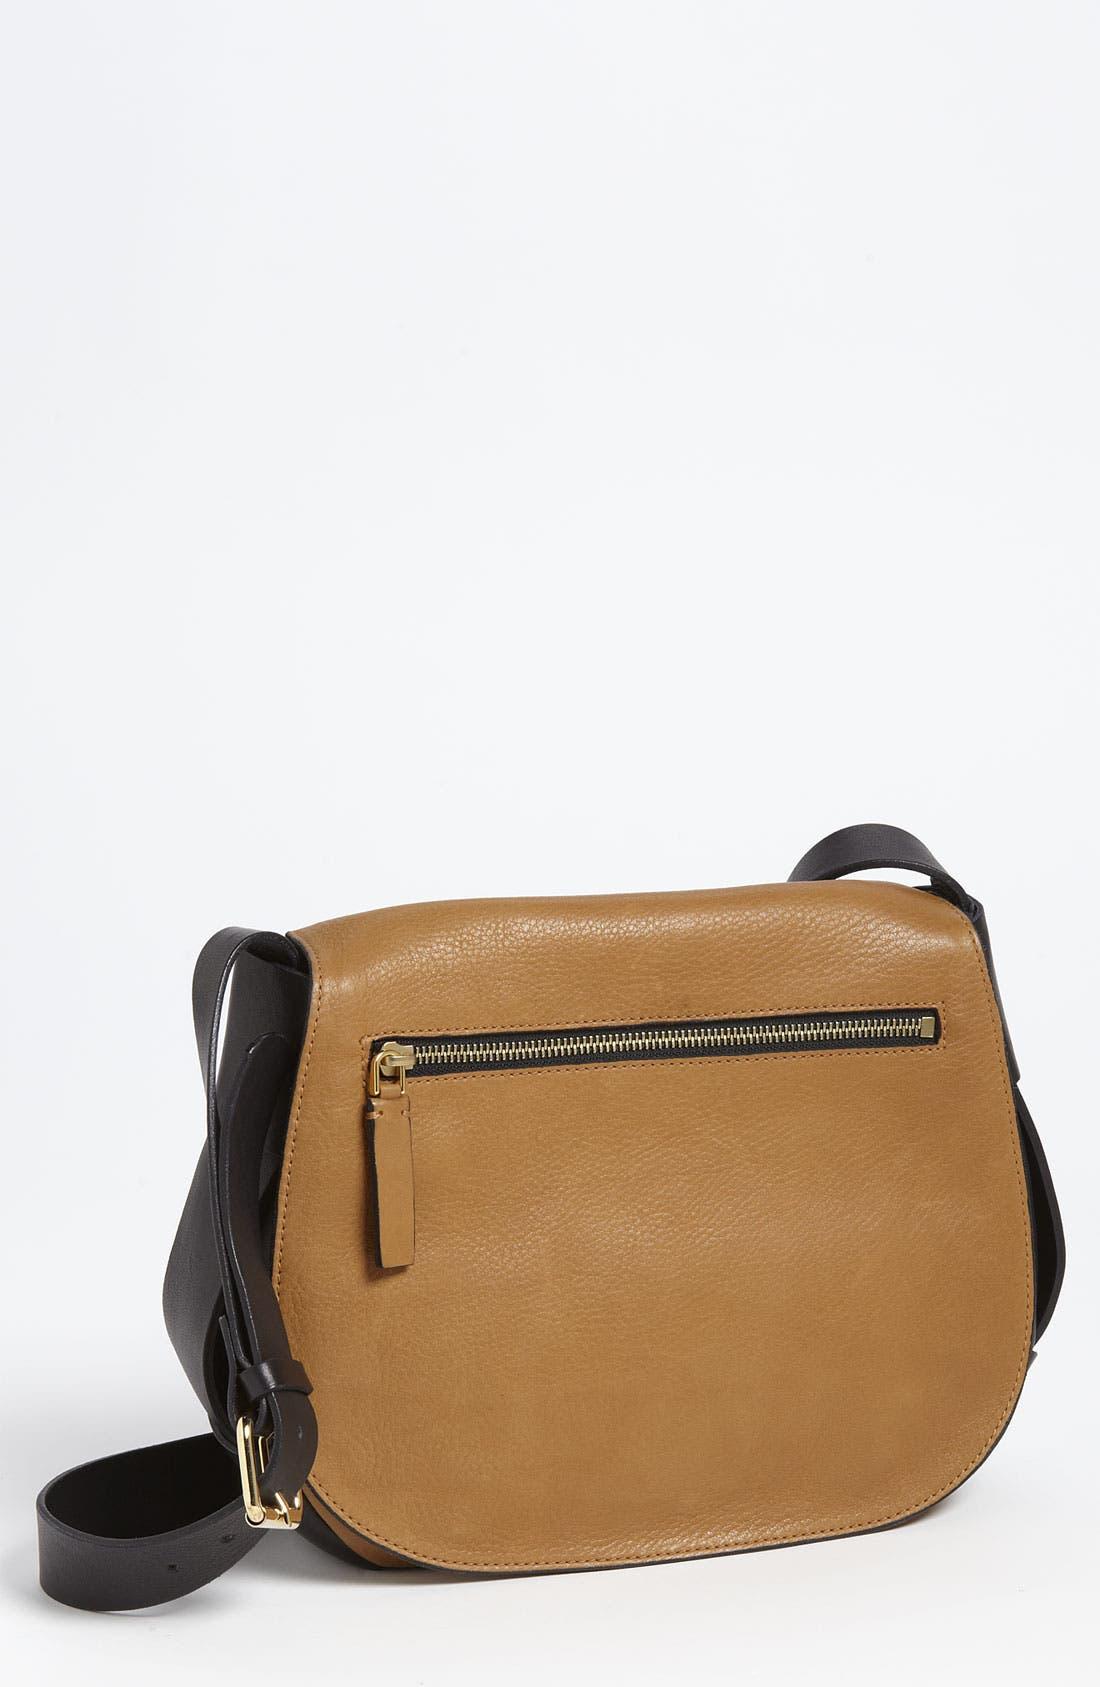 Main Image - Marni 'Small' Bicolor Crossbody Bag